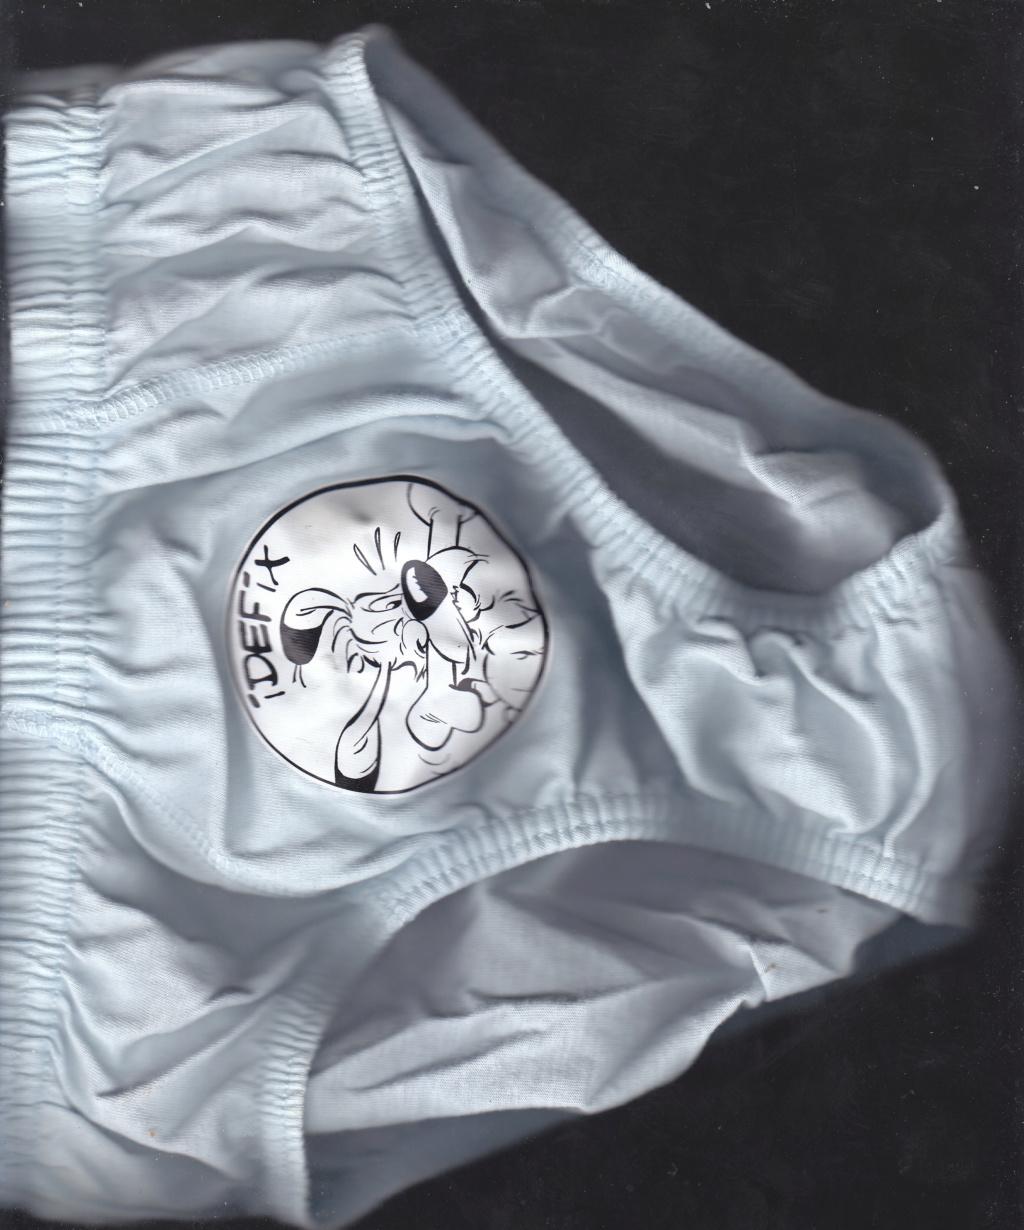 2003_s10.jpg